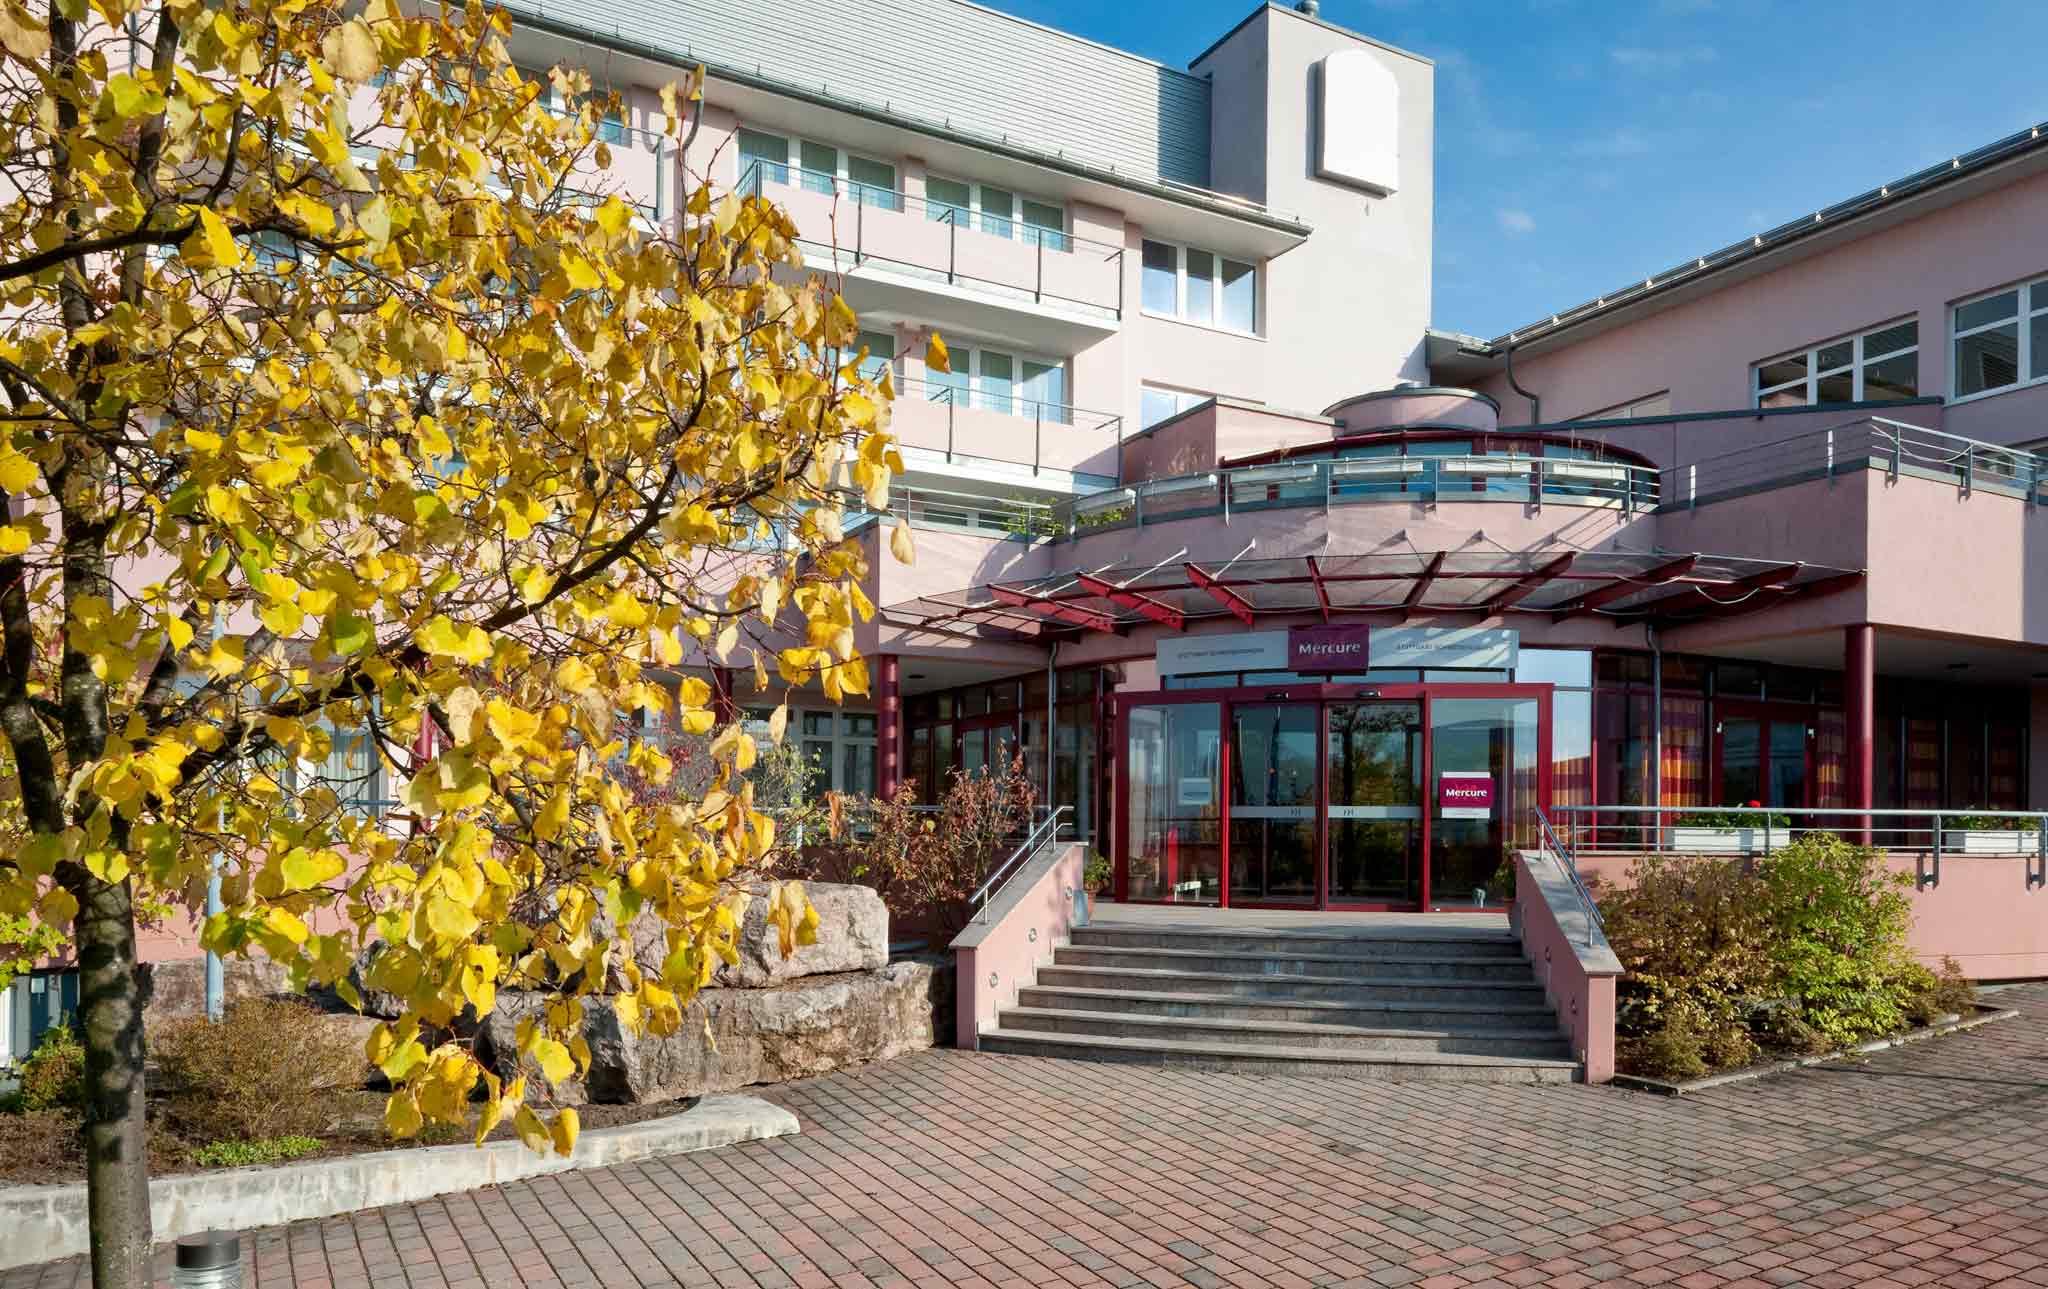 Mercure Hotel Stuttgart-Schwieberdingen Vista esterna